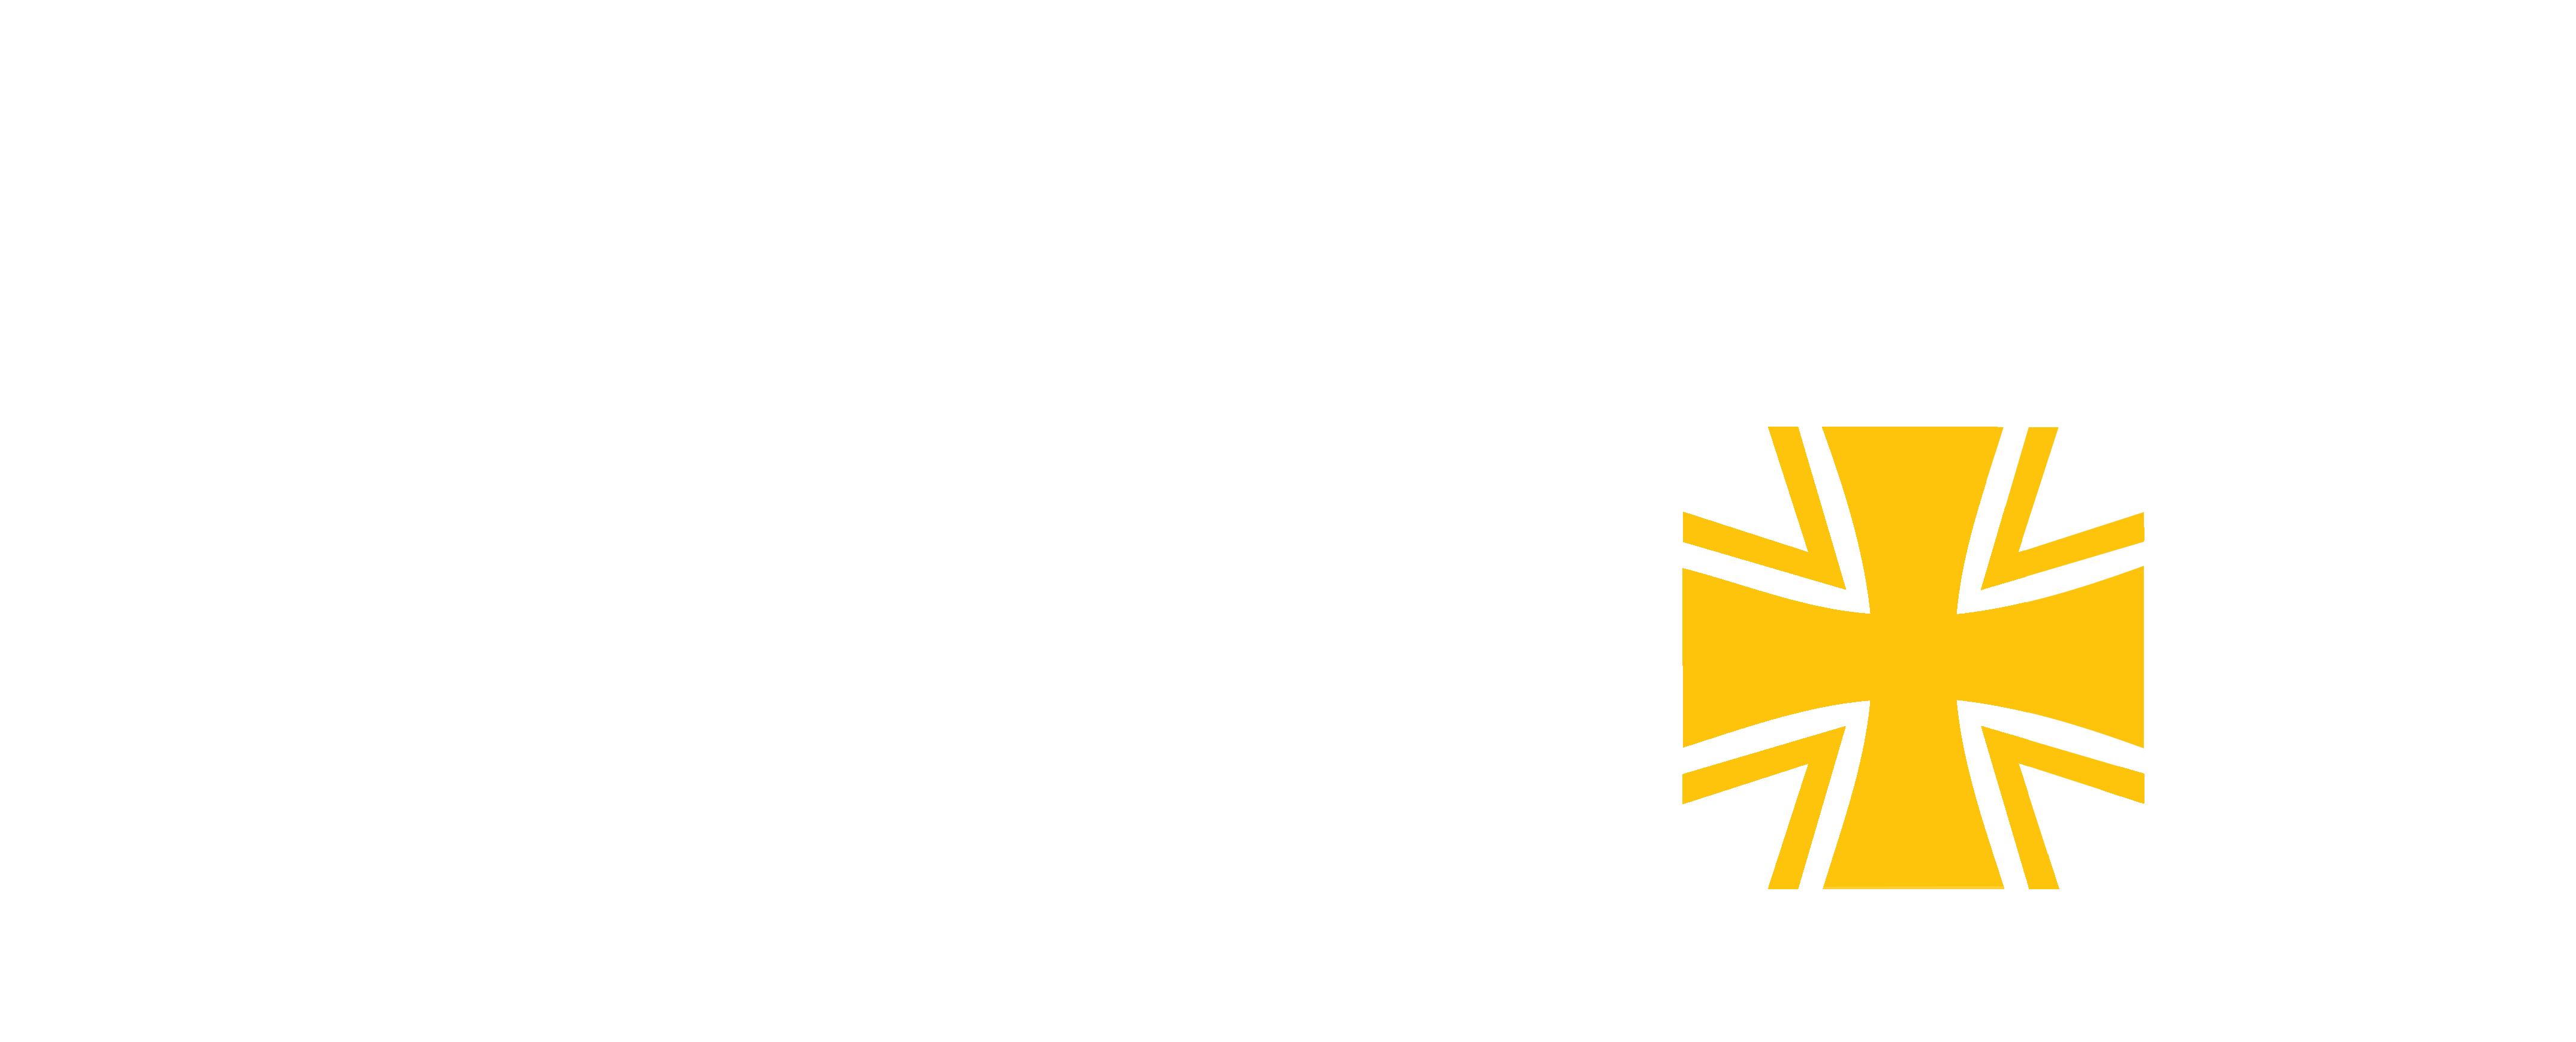 BWMOD